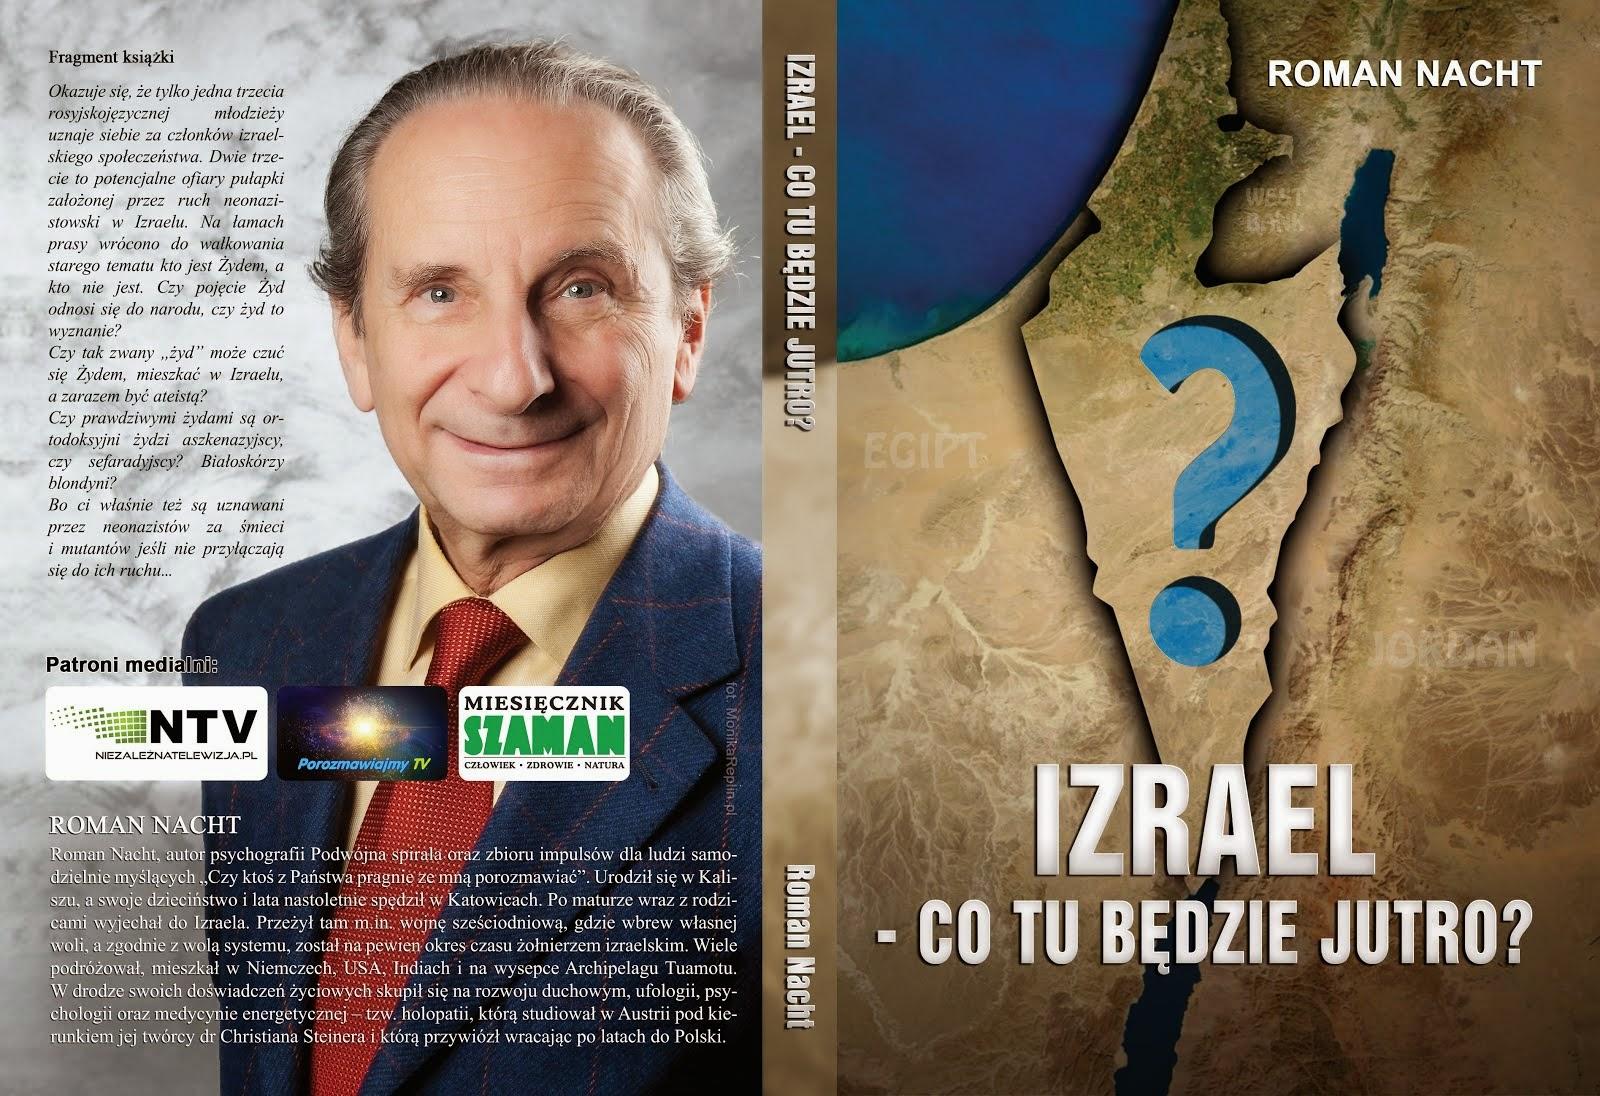 Izrael - co tu będzie jutro